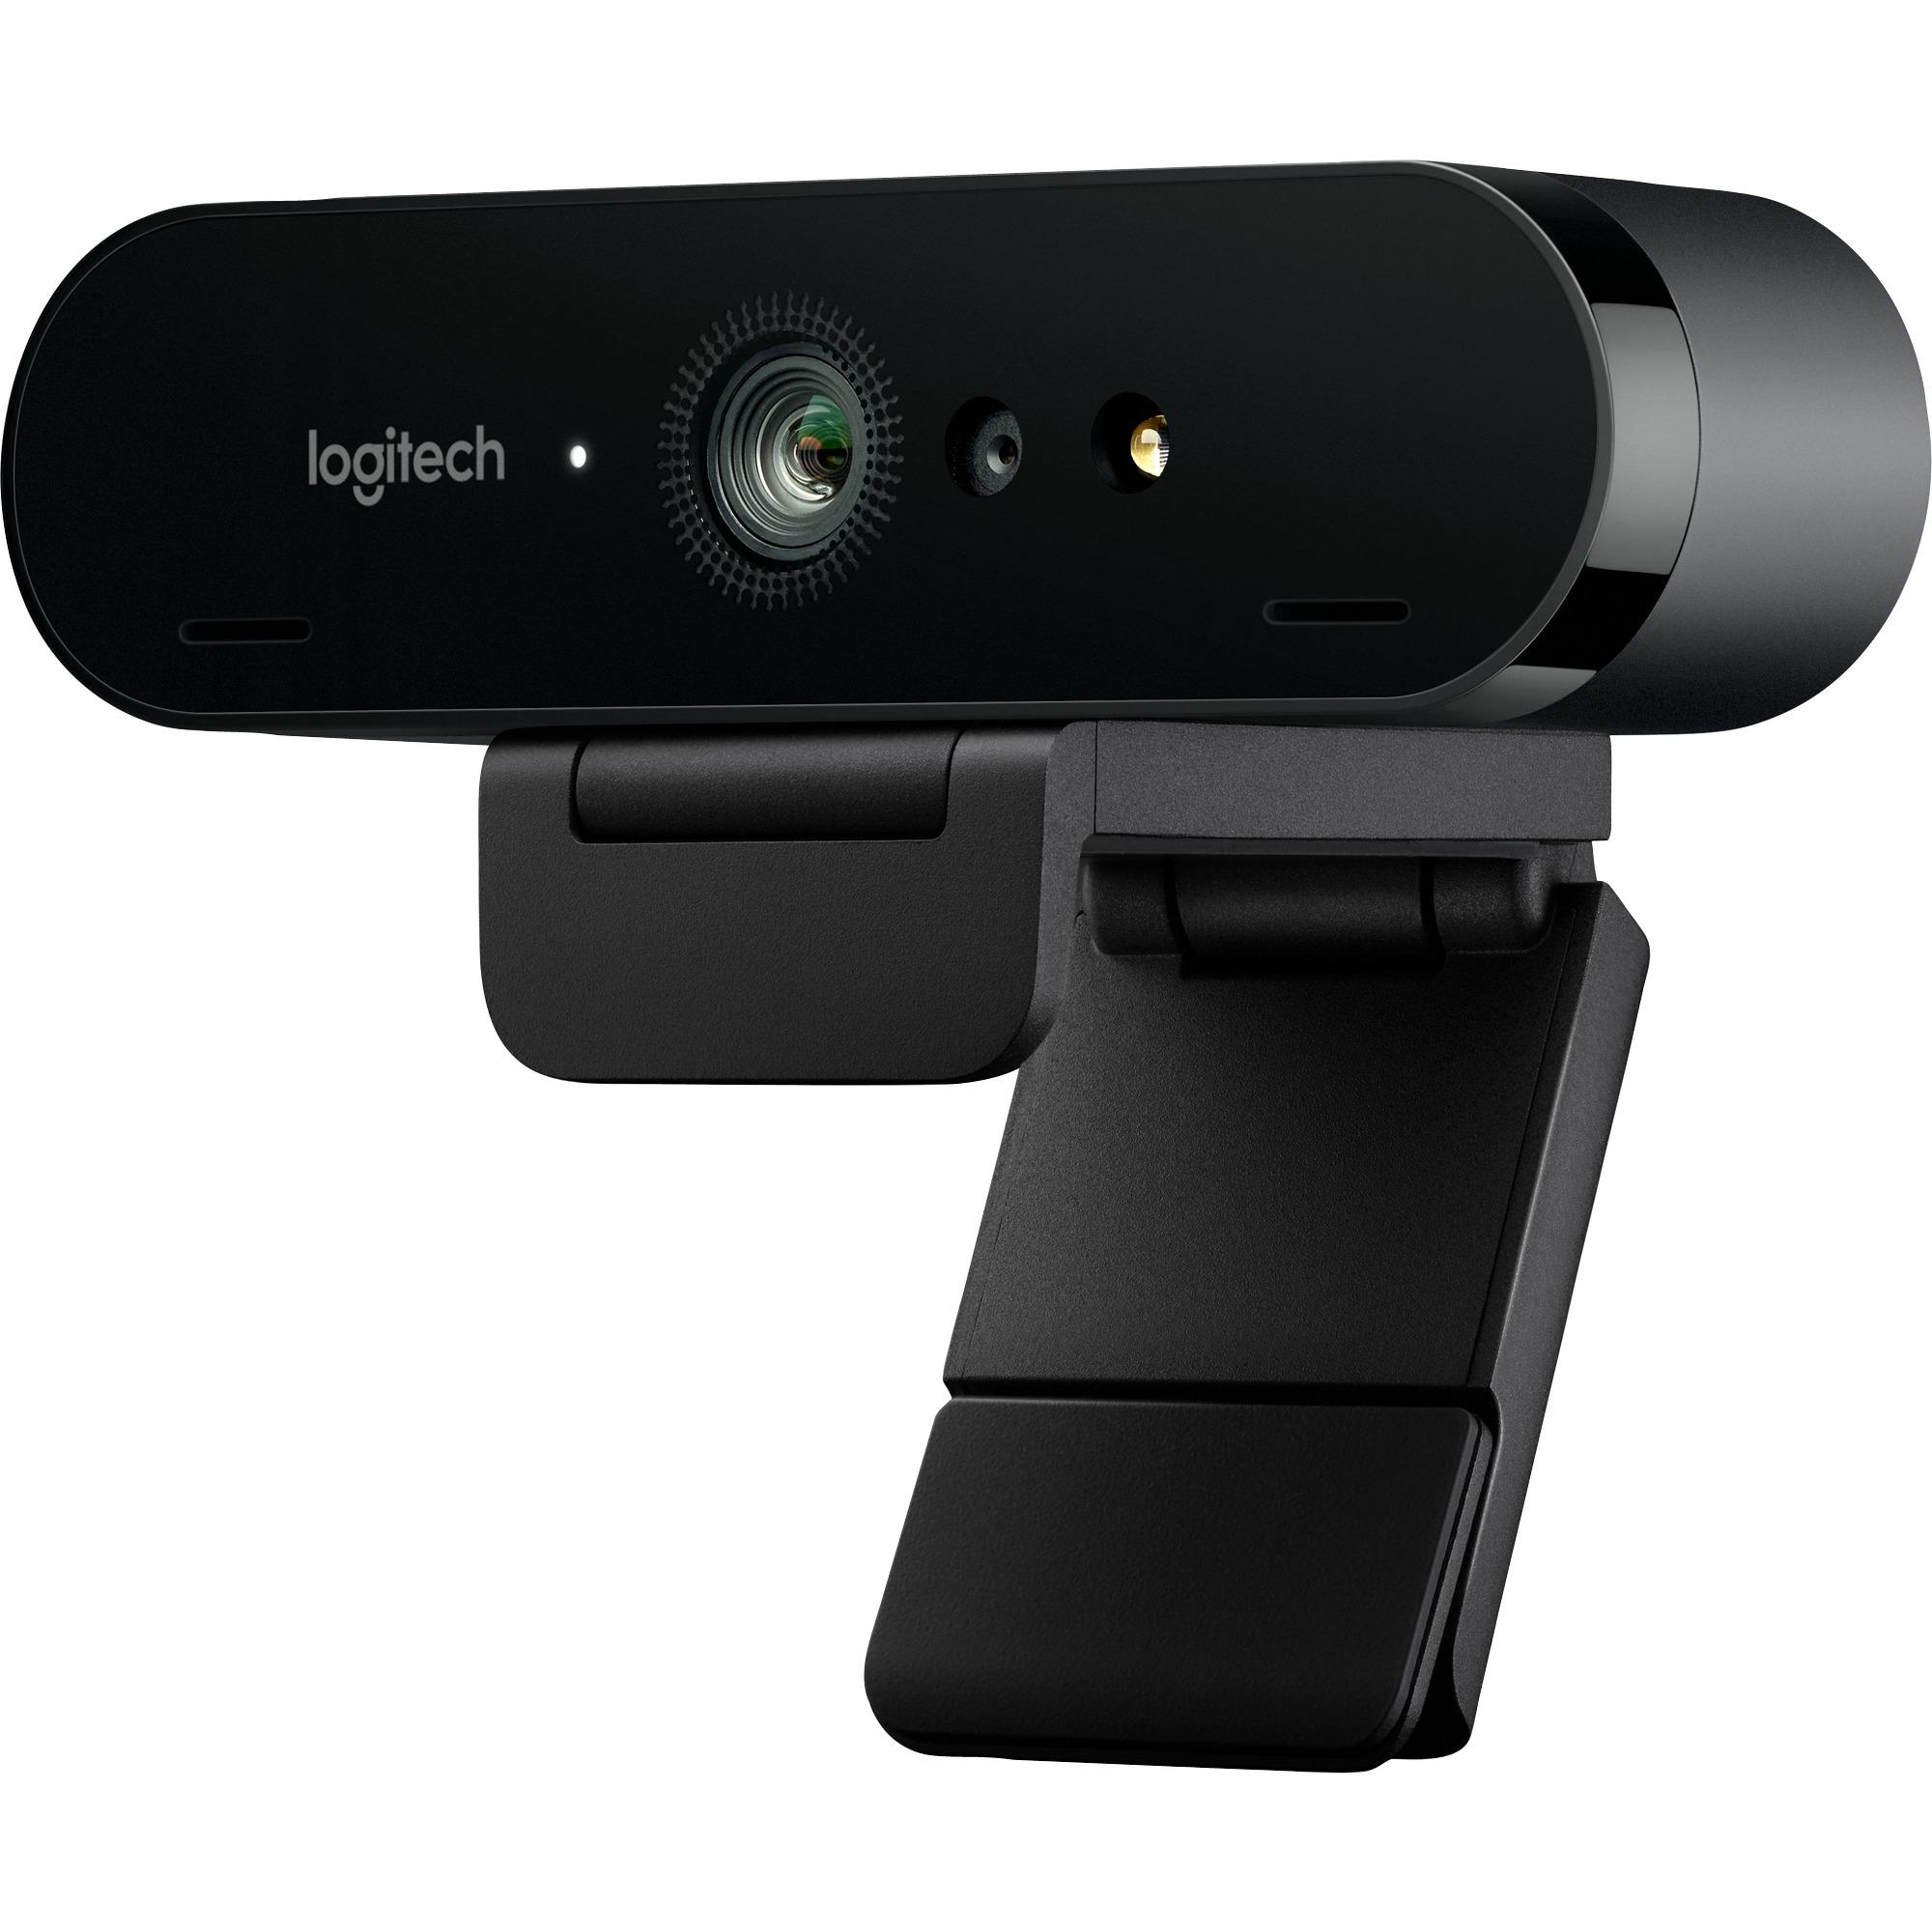 BRIO cámara web 4096 x 2160 Pixeles USB 3.0 Negro, Webcam